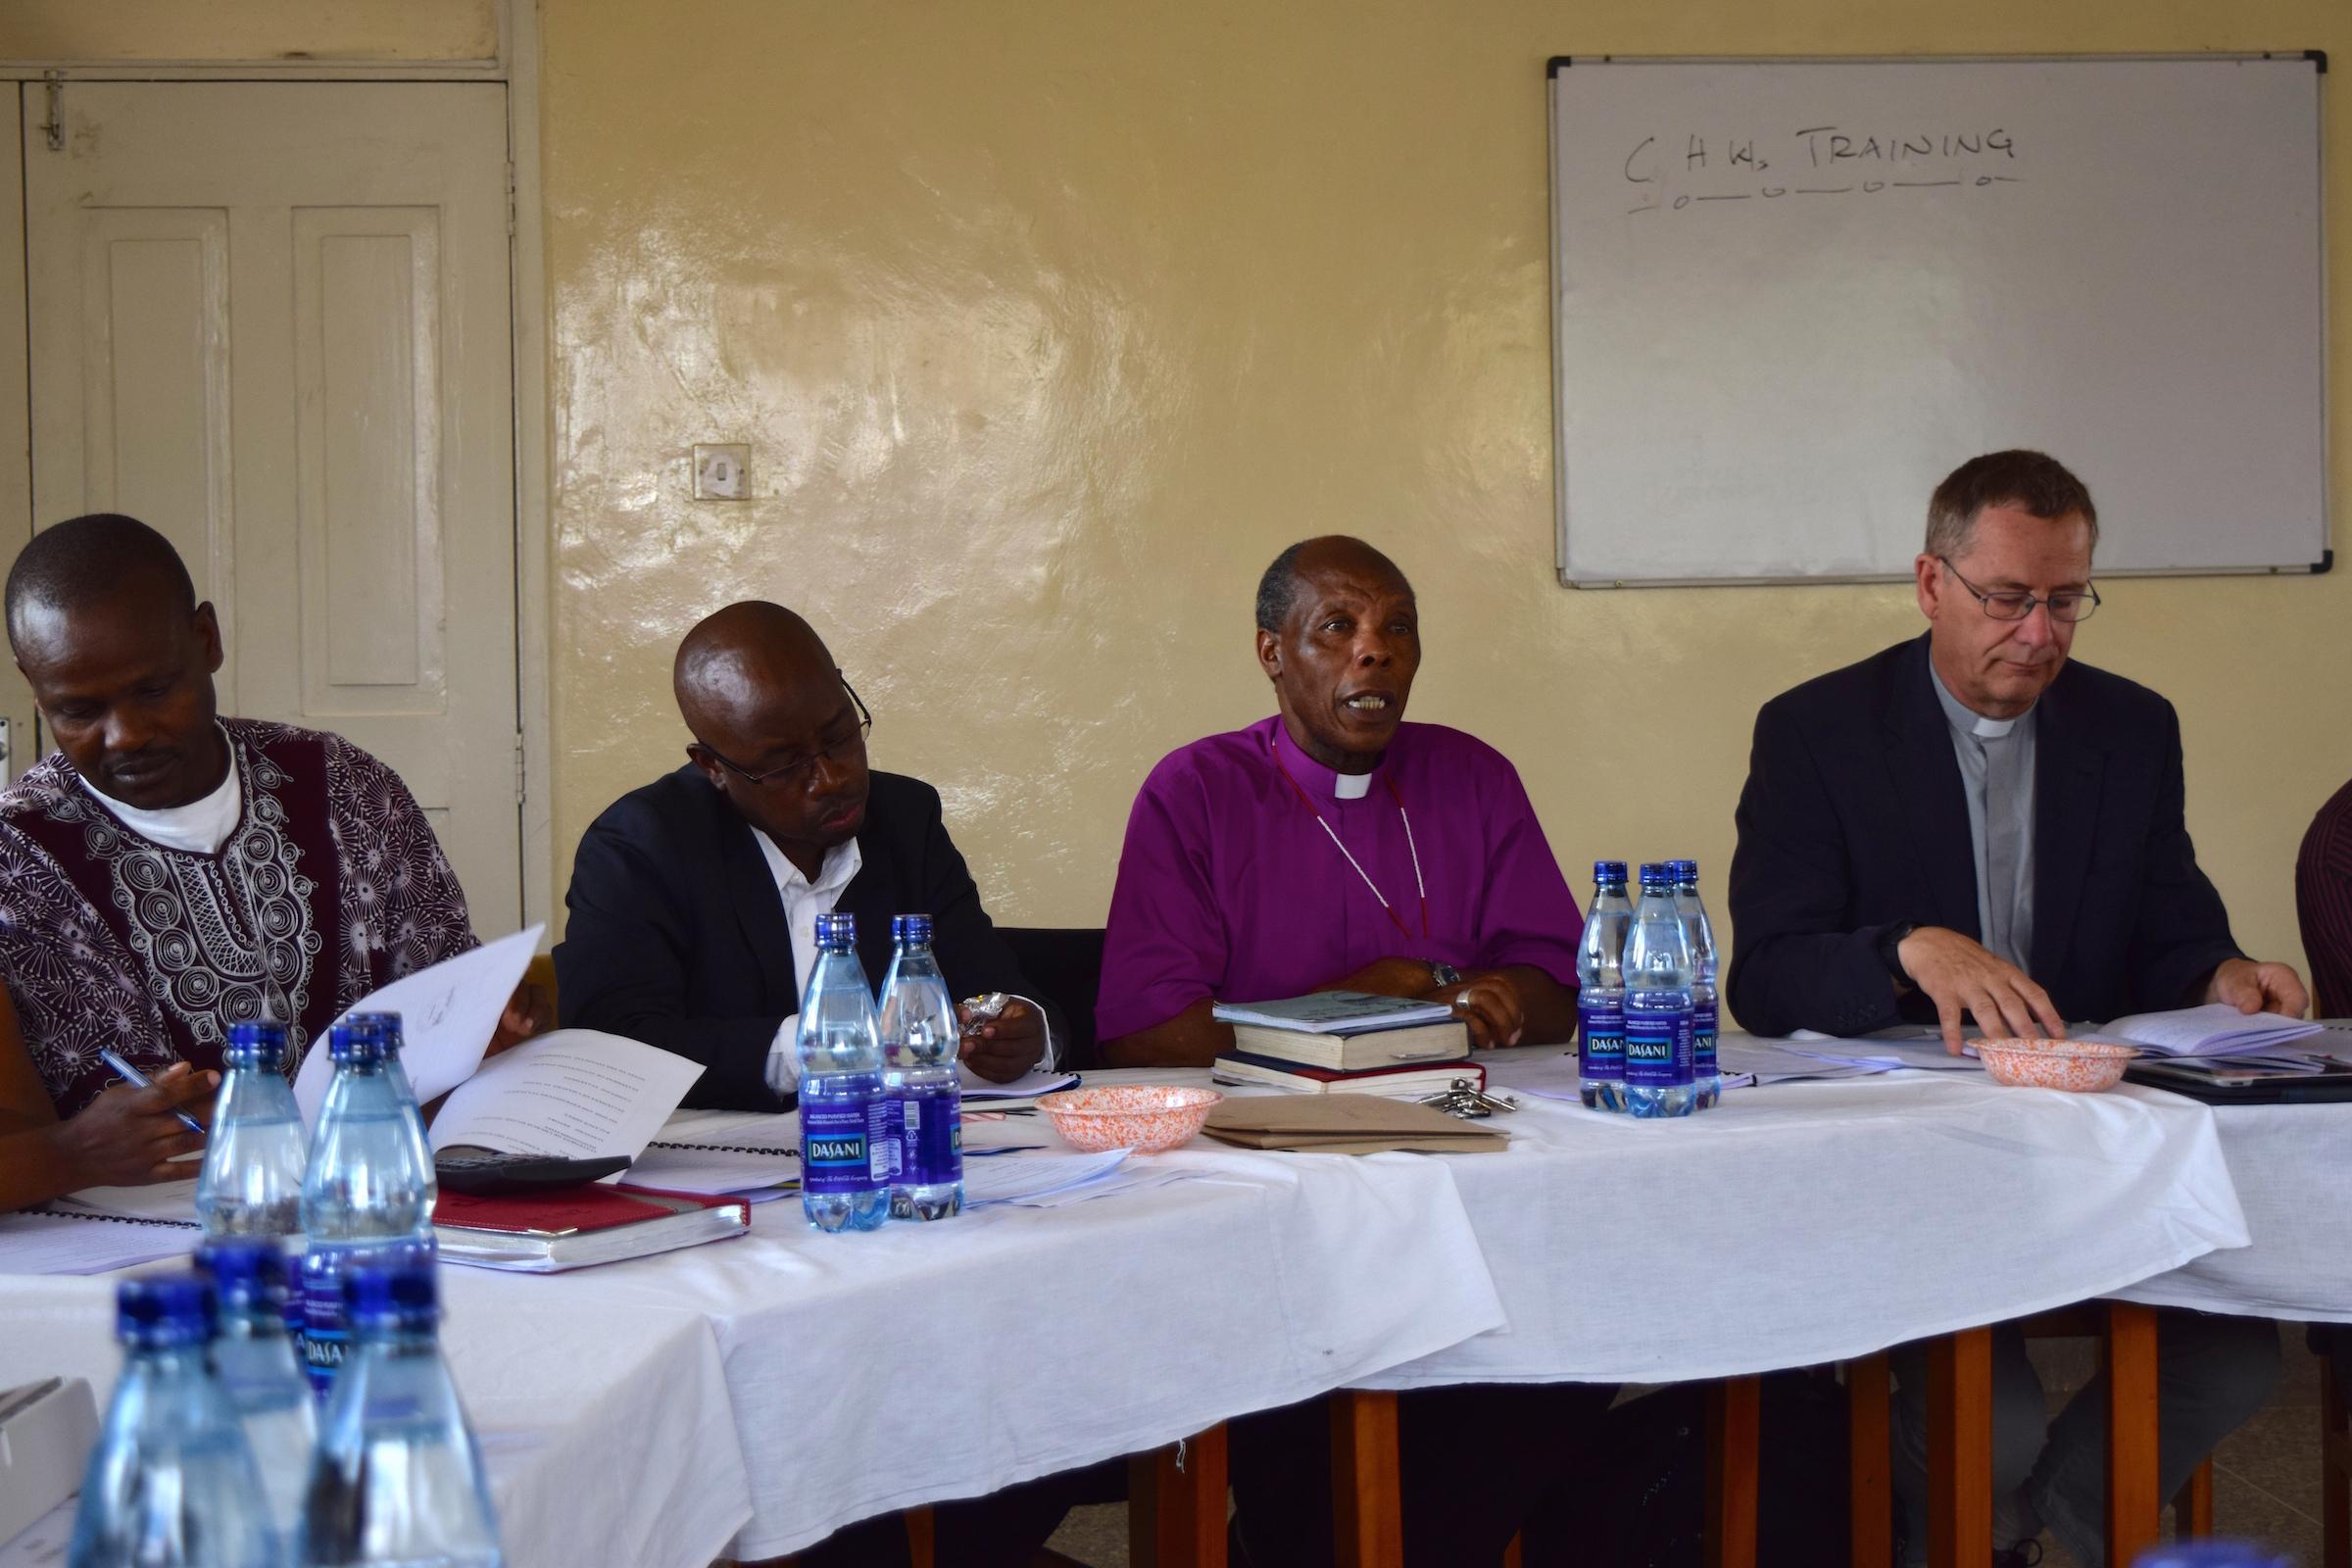 JMCK Meeting in Nairobi